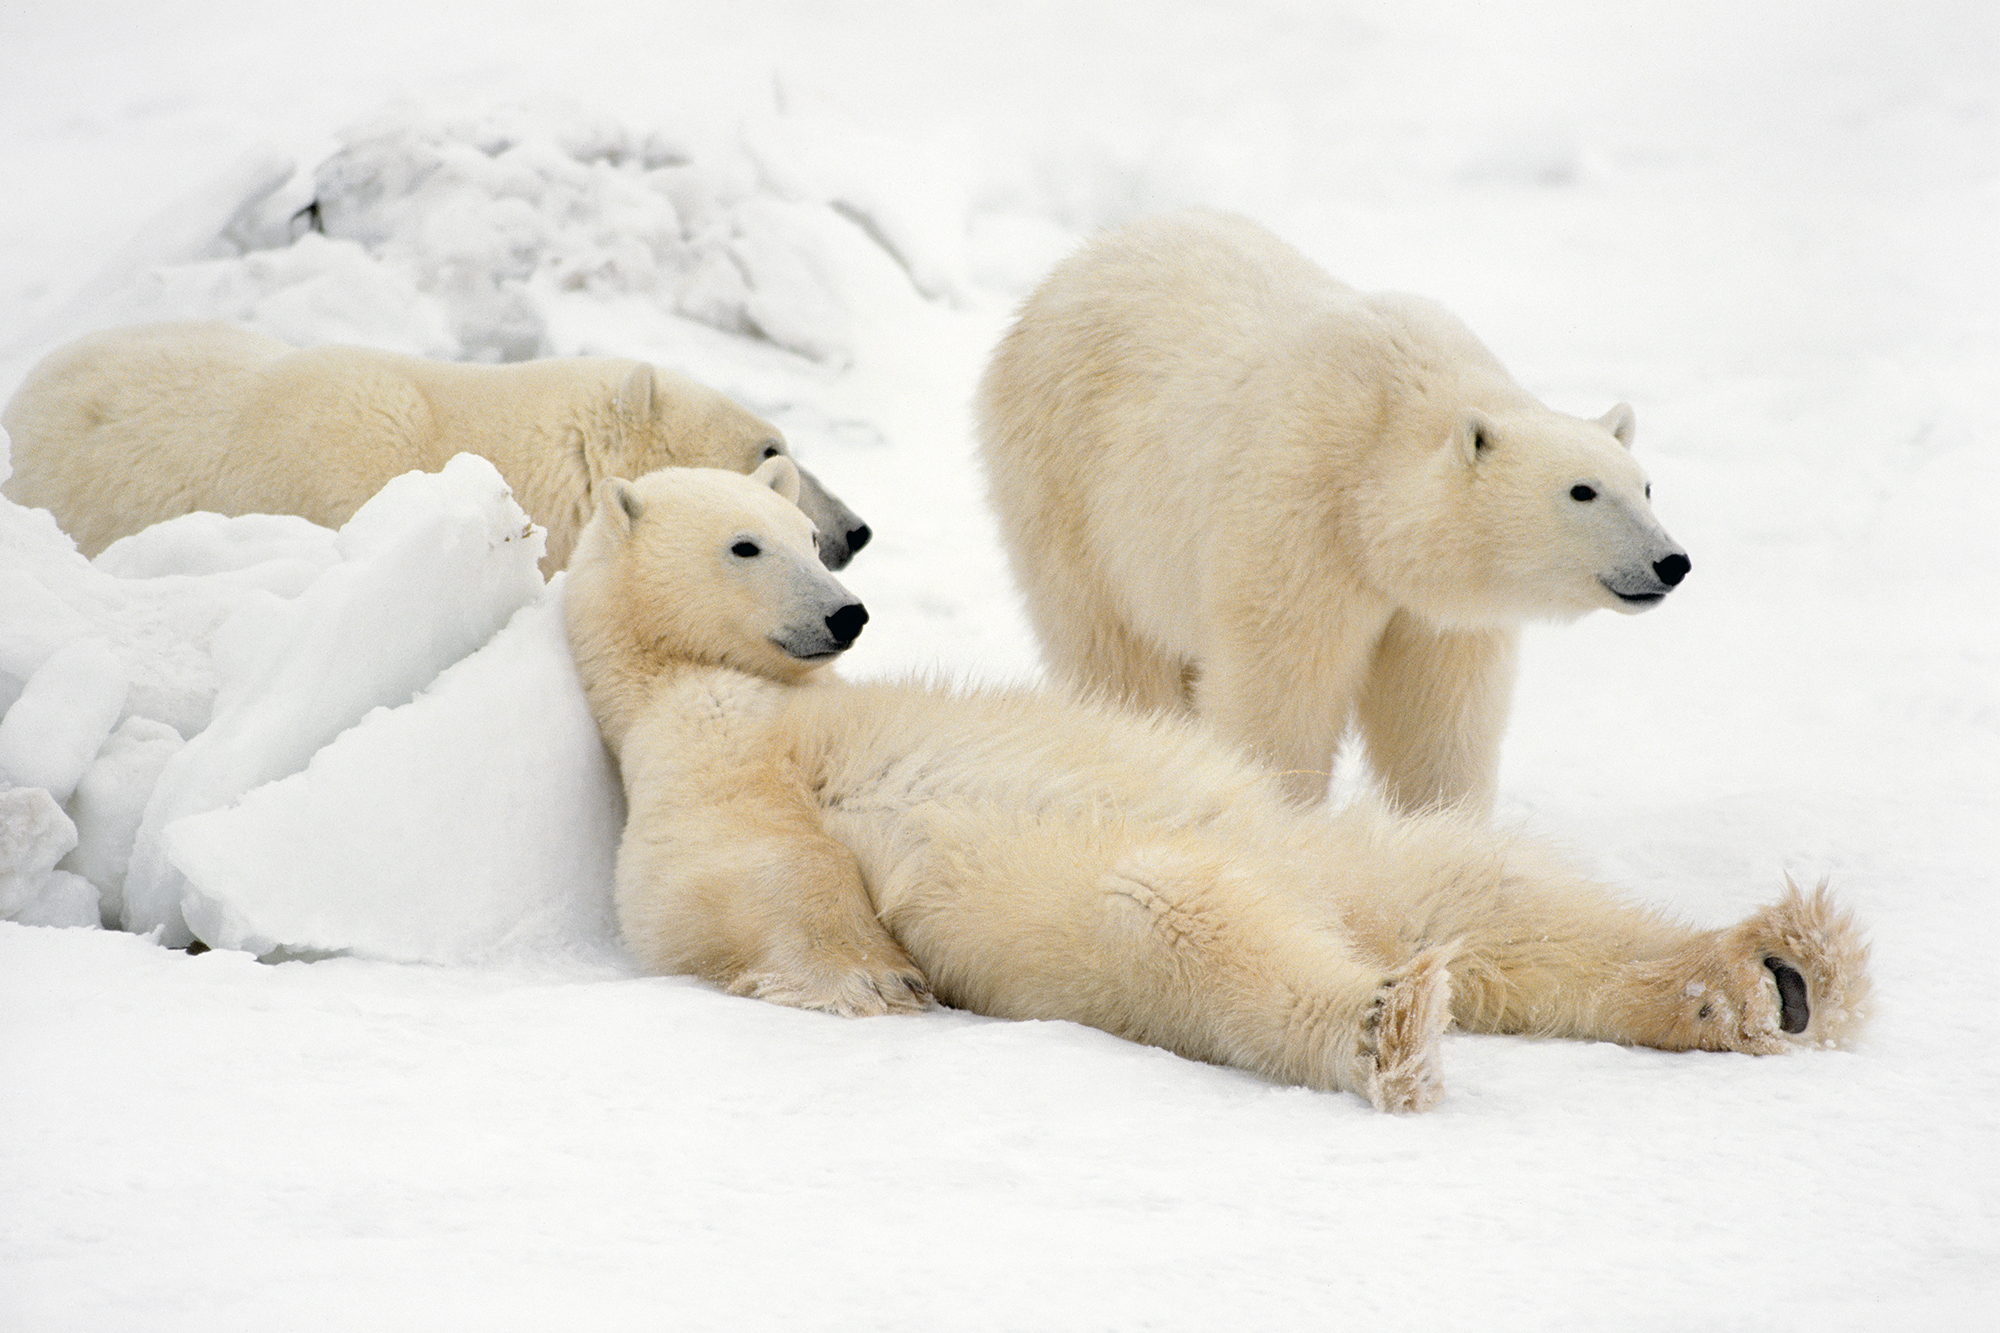 'Bad Boys of the Arctic', polar bears in Hudson Bay, Canada (Thomas D Mangelsen)